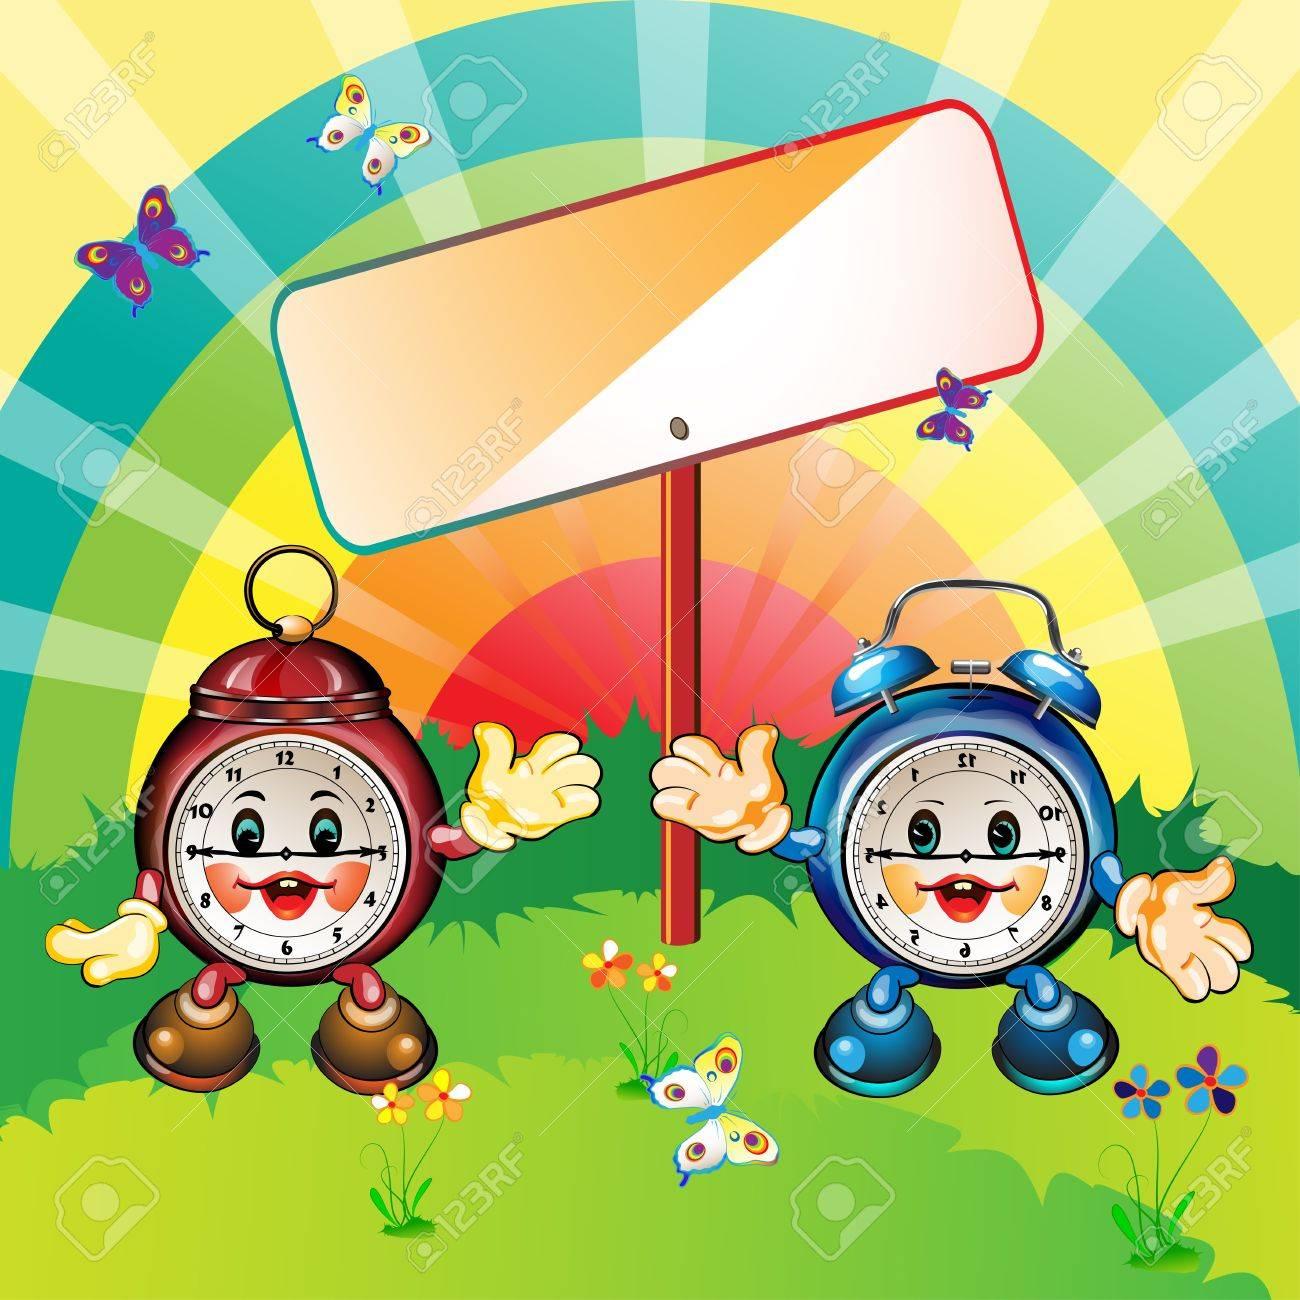 Cute and happy cartoon clocks, park outdoor, card illustration Stock Vector - 12984536